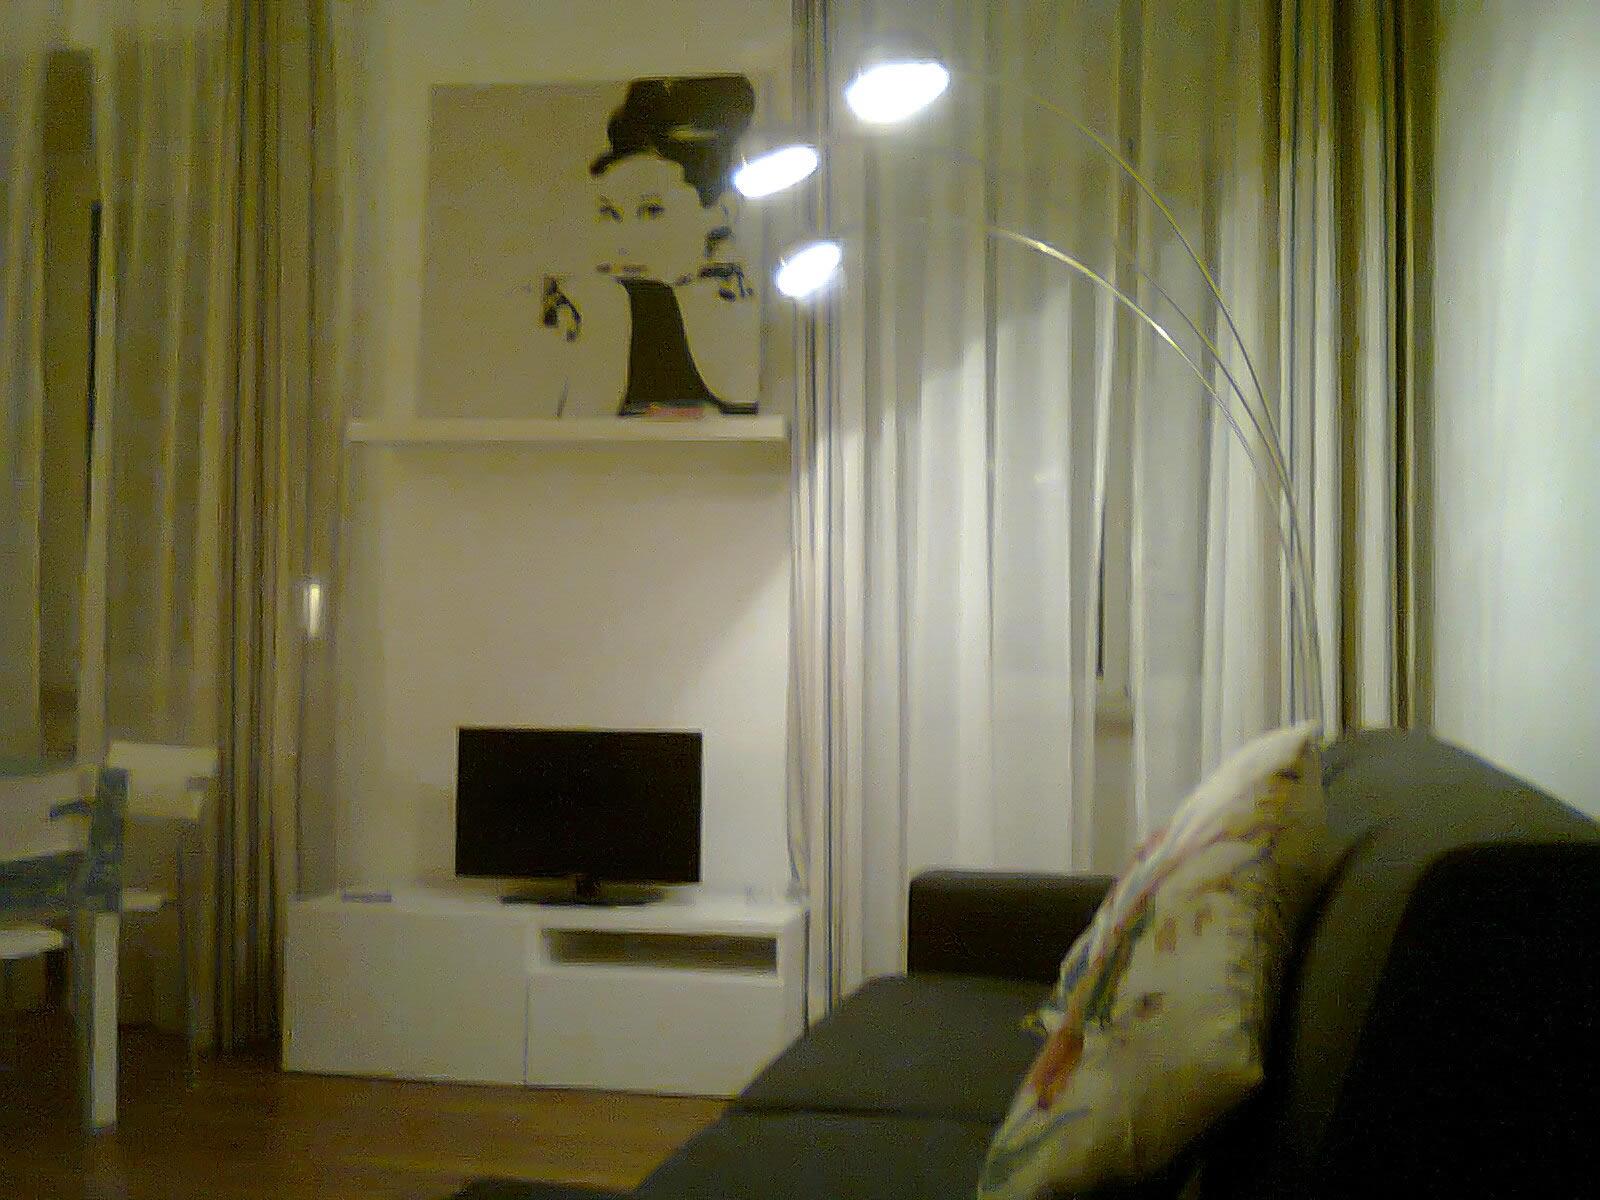 affitto casa vacanze citta roma 8086 (20130307110354-2013-13950-NDP.jpg)